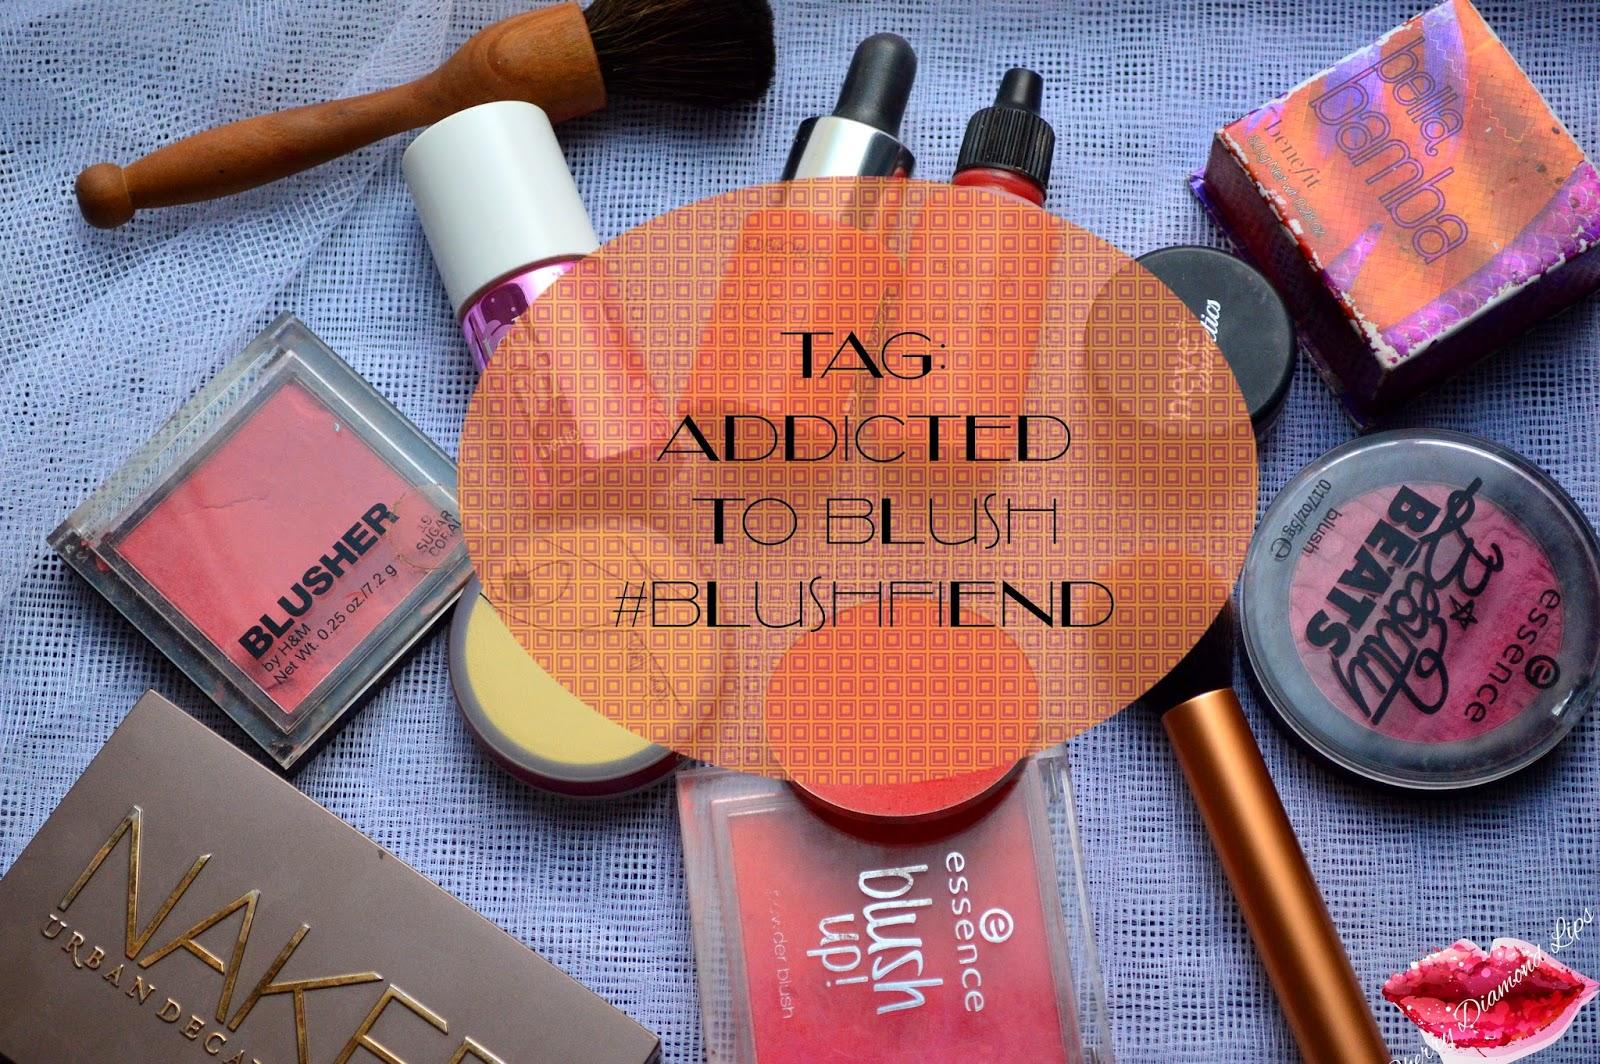 Addicted to blush, tag, #blushfiend, Cherry Diamond Lips